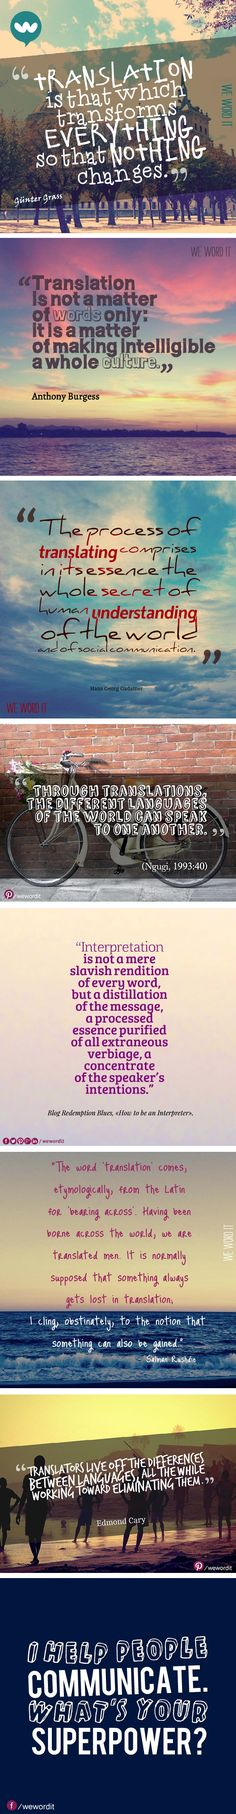 #xl8 #t9n #x8n #quotes on #translation #translator #xl8r #t8r #interpreting #1nt #xl8quote